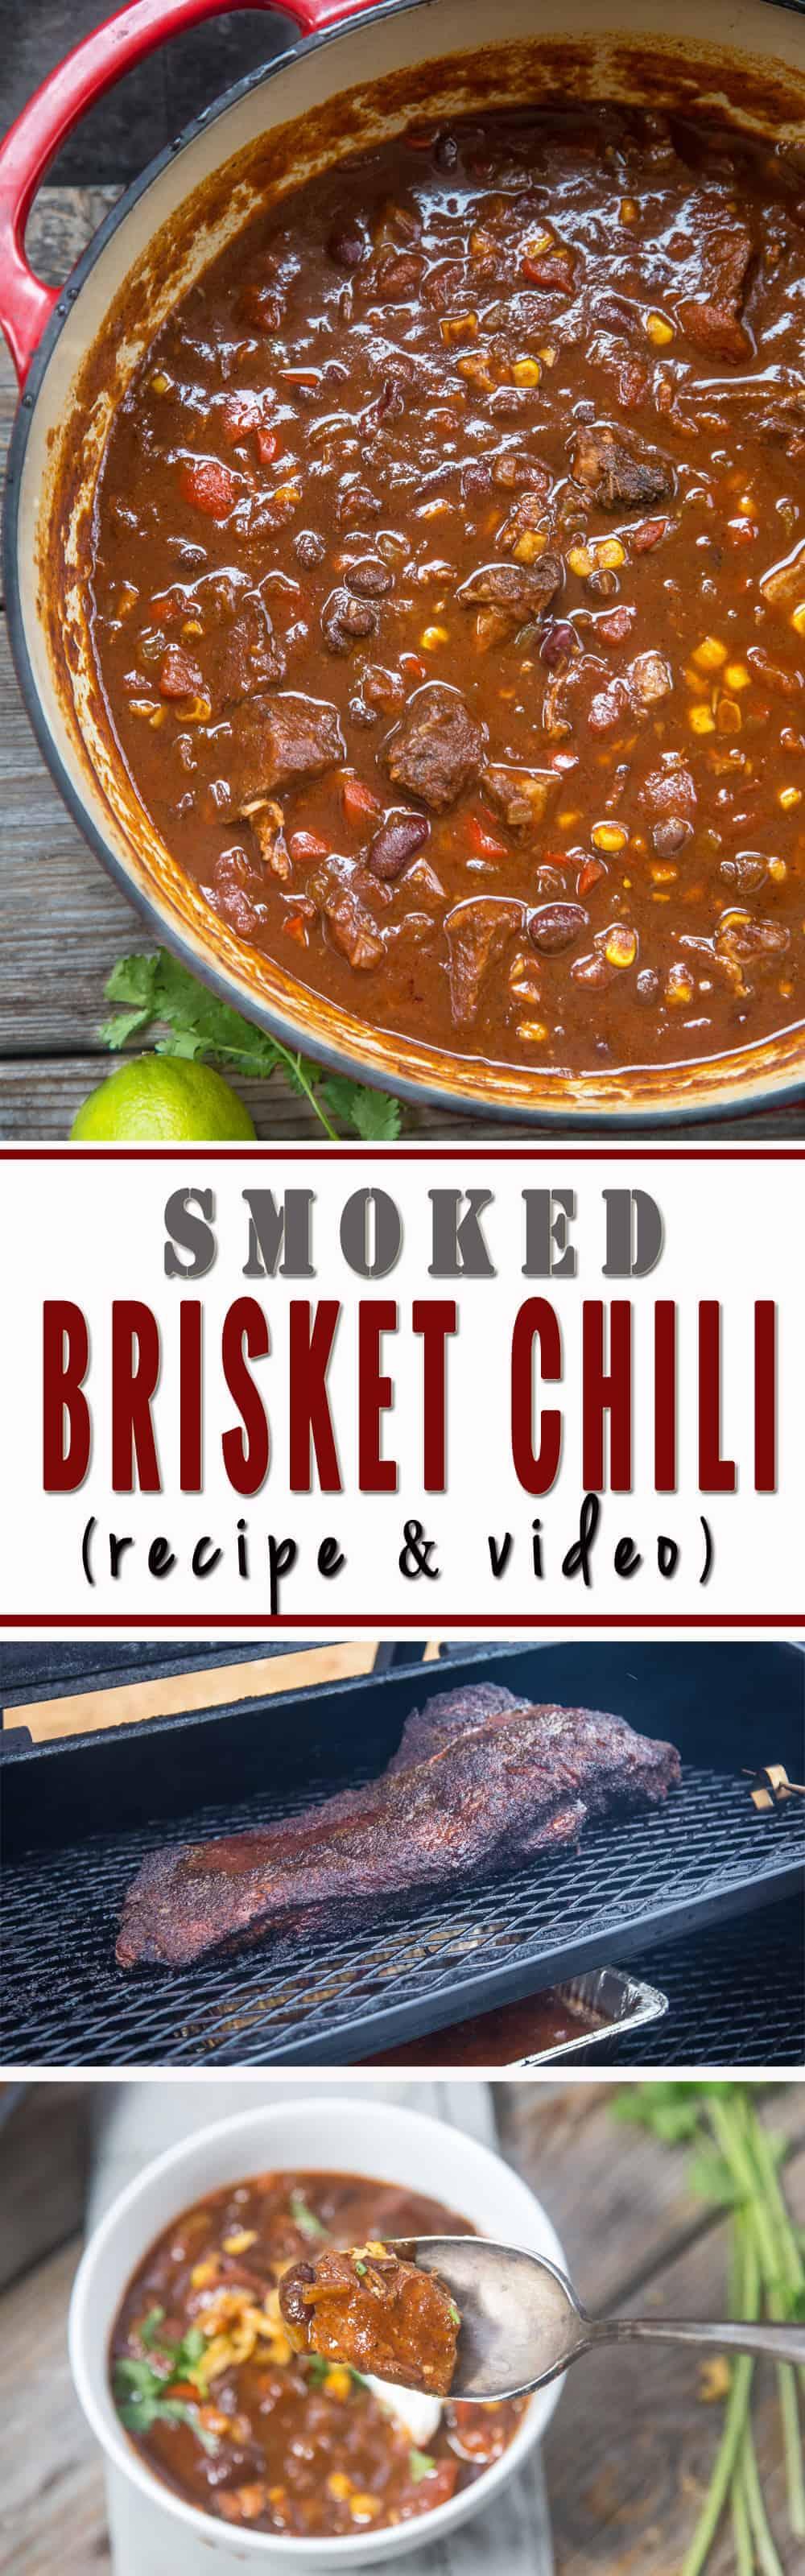 Award-Winning Smoked Brisket Chili! Use up leftover brisket to make this indulgent, rich, and smoky chili. Recipe and Video!